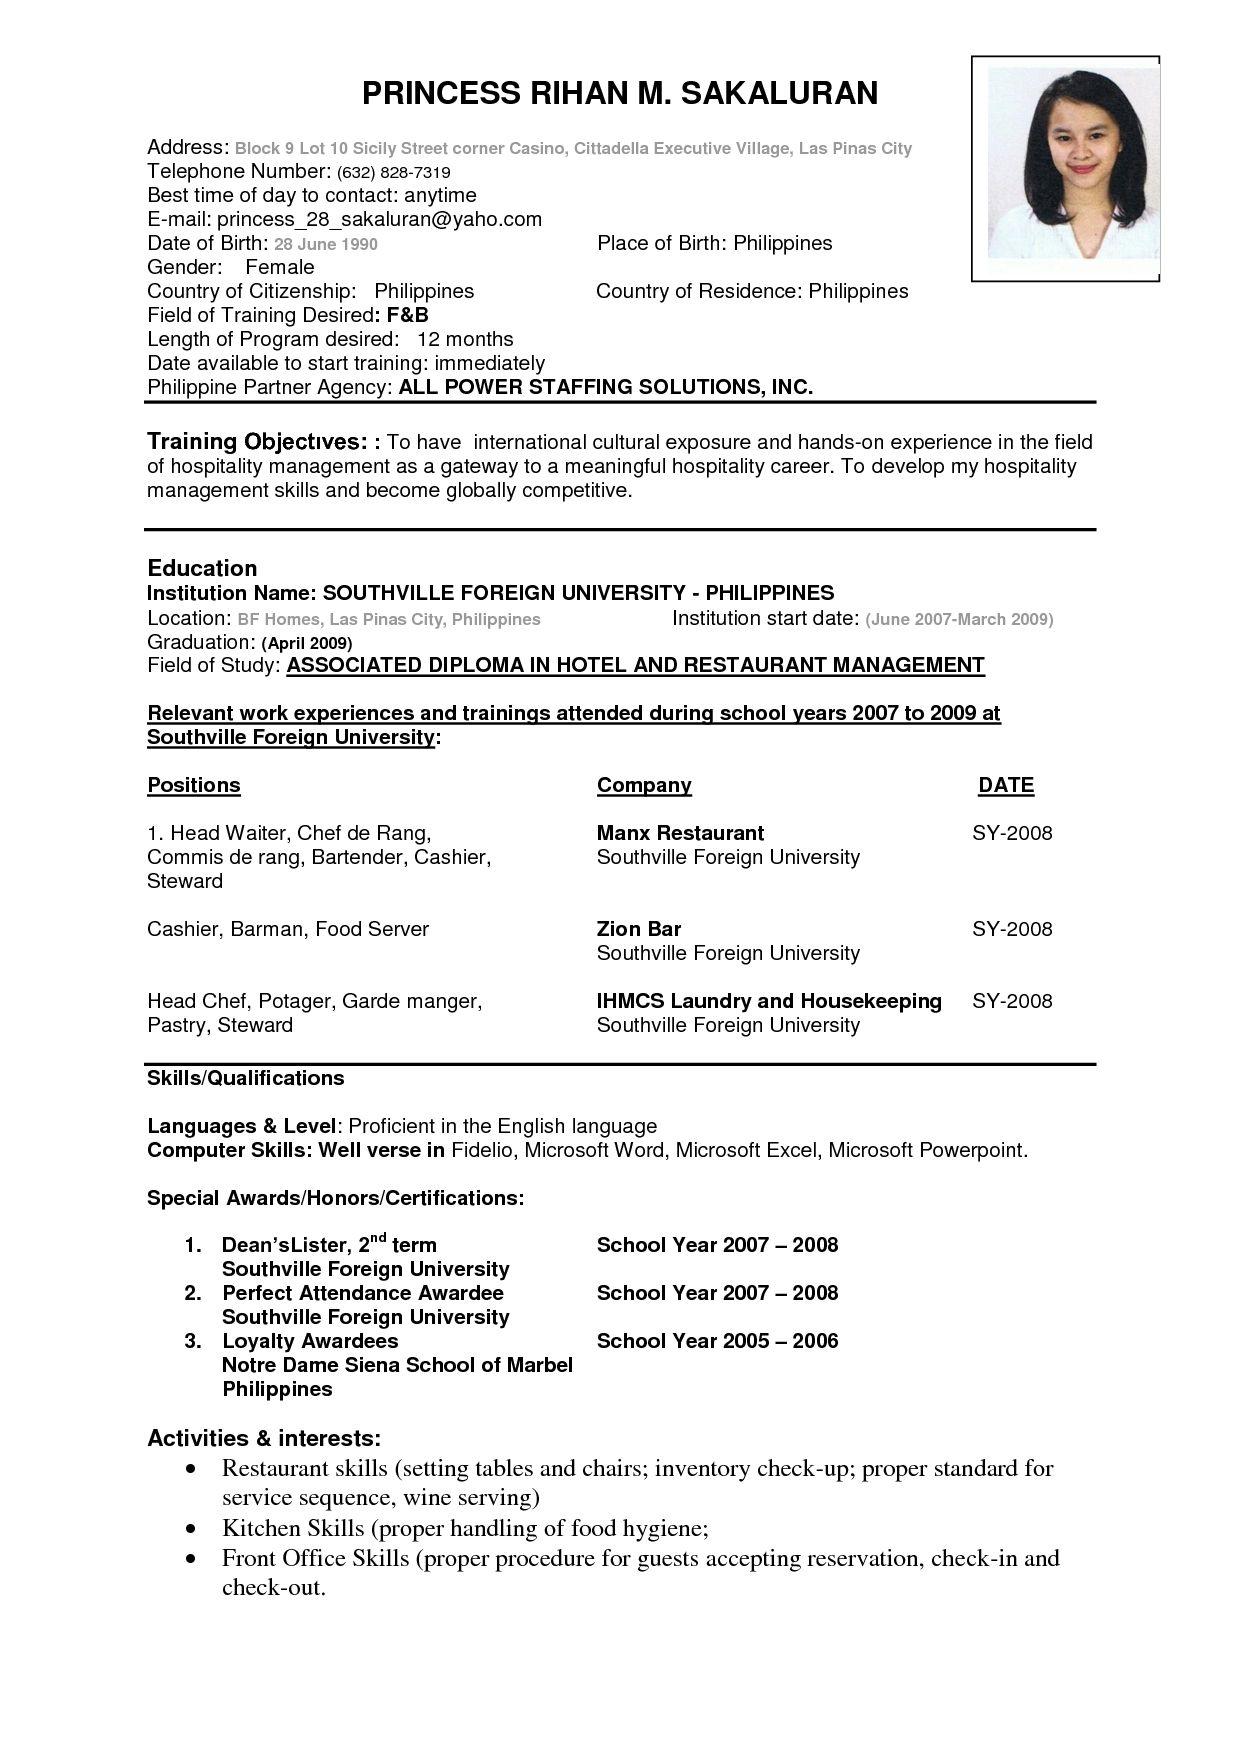 30 Fresh English Job Application Letter Example Graphics WBXO